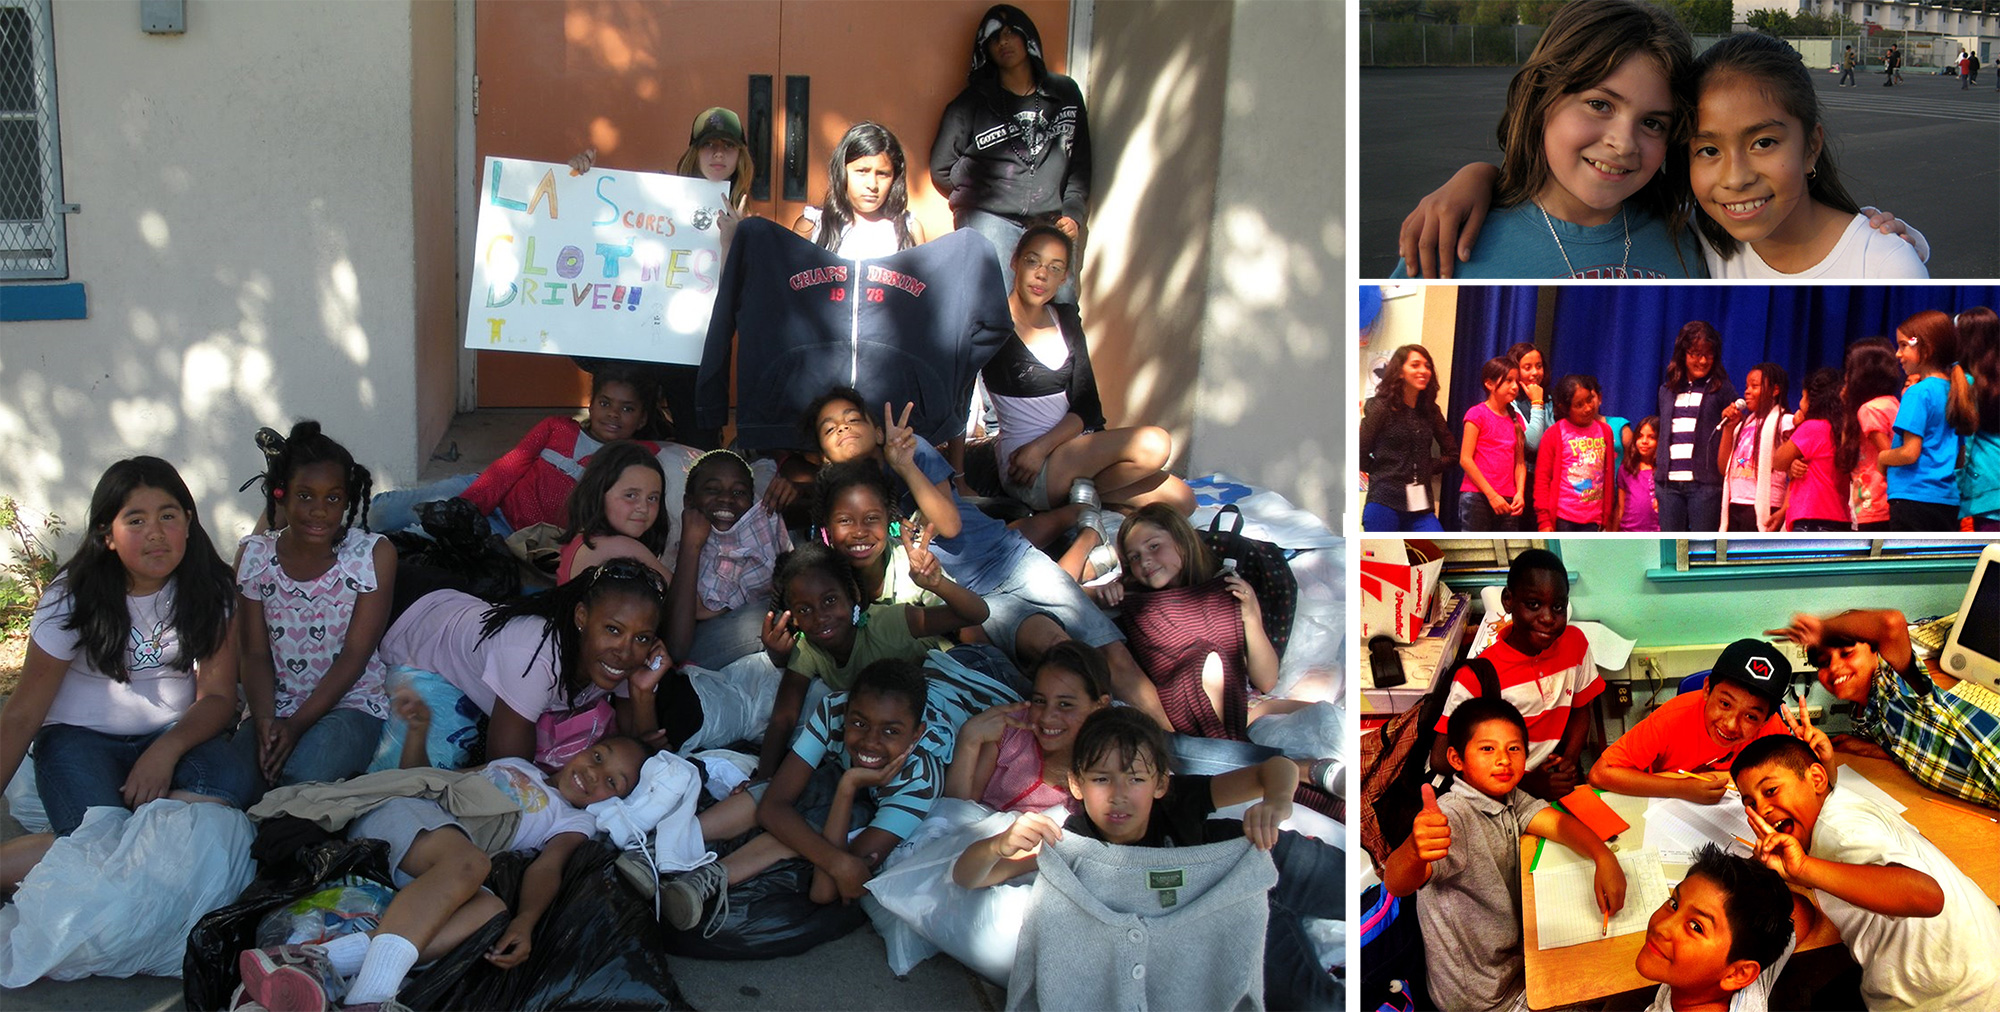 Los Angeles America Scores Community Service